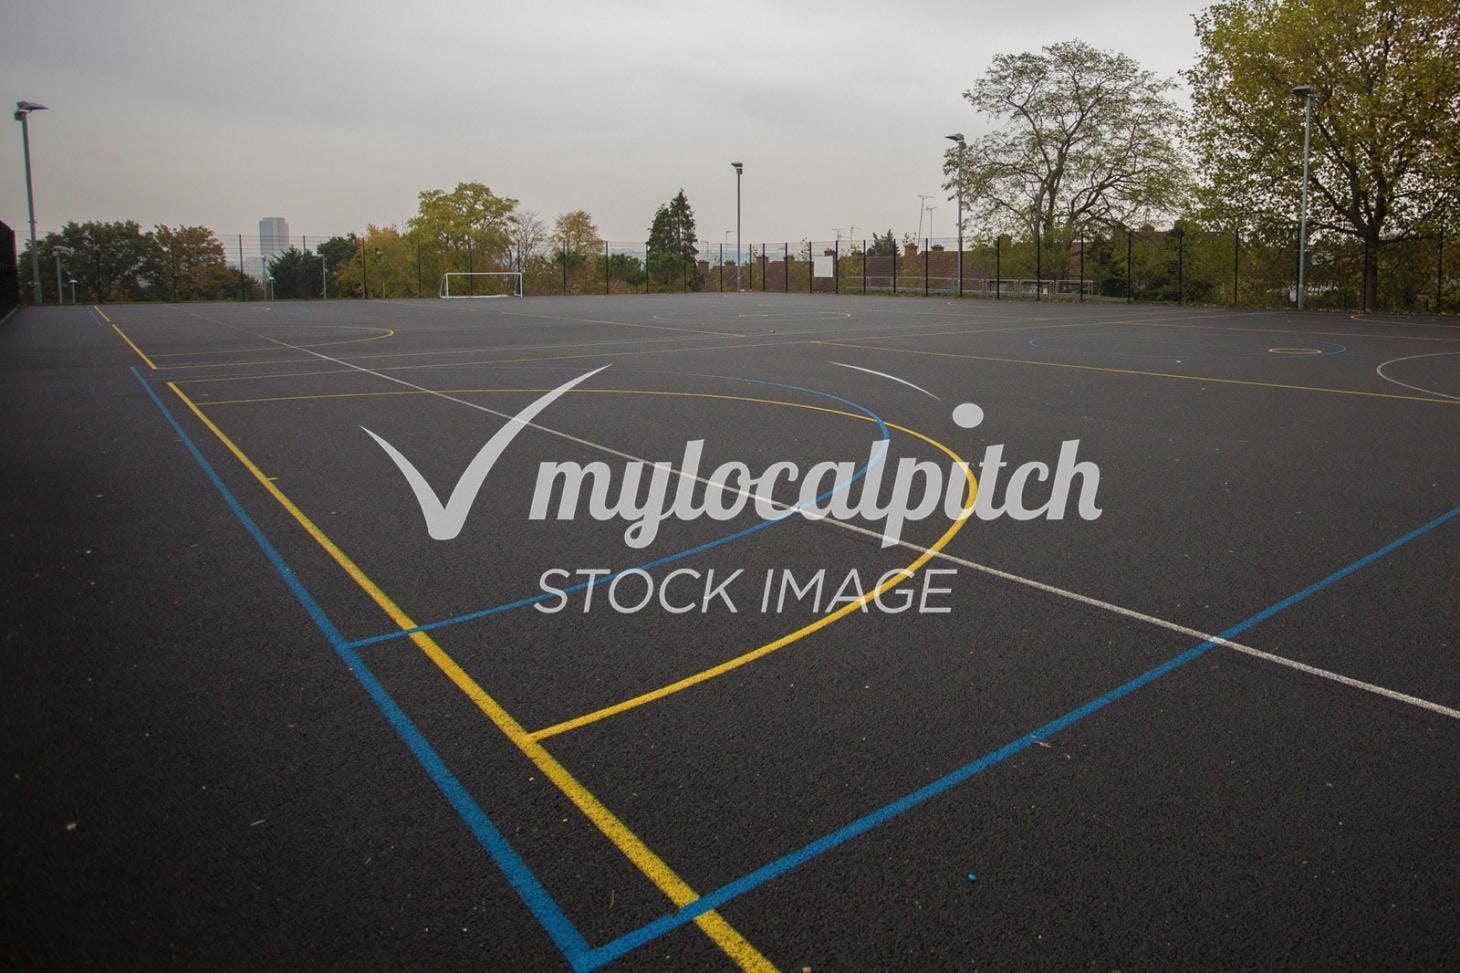 Tolworth Court Ground Outdoor | Concrete tennis court